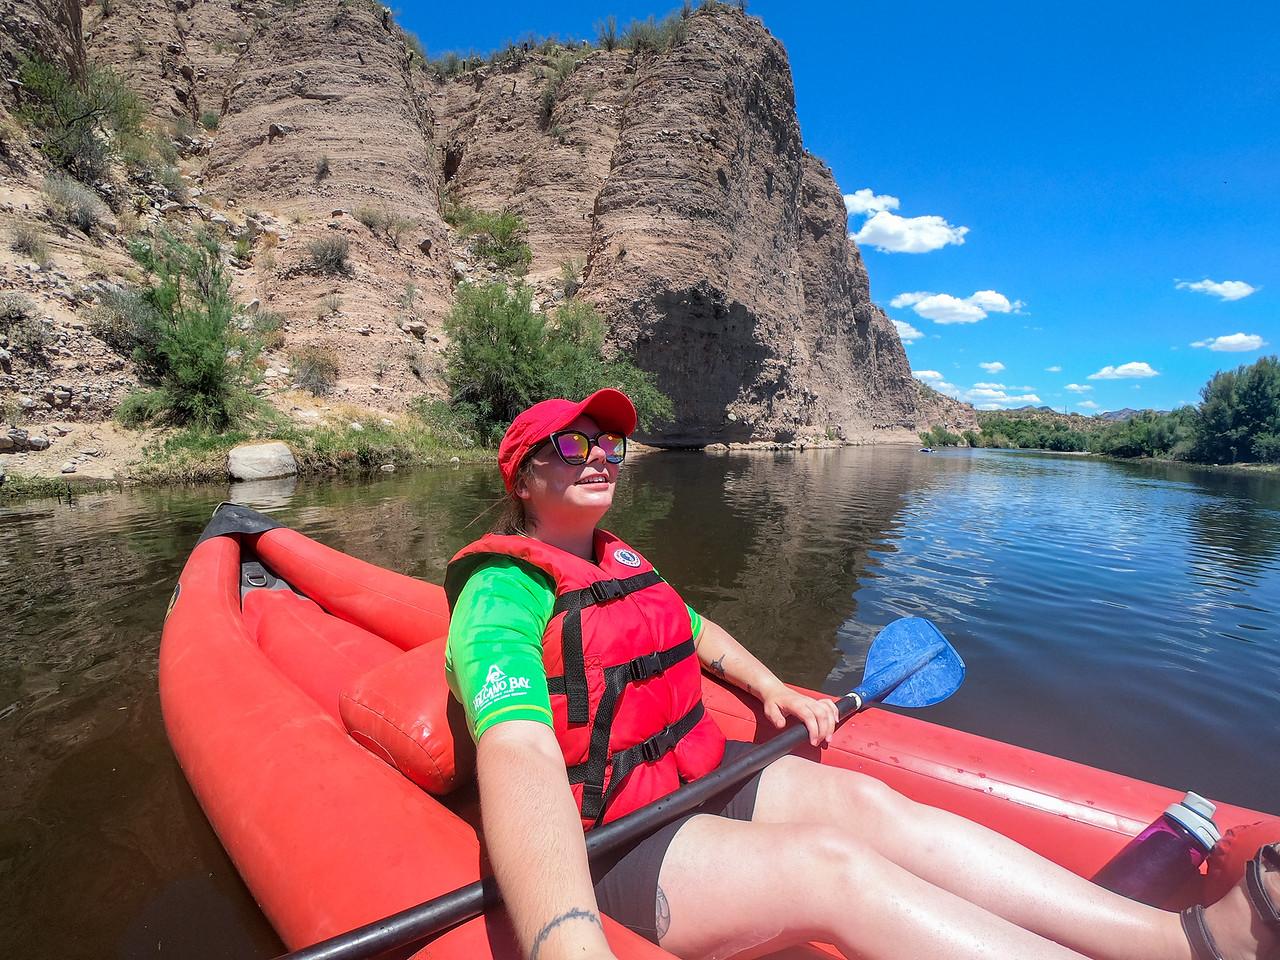 Kayaking the Lower Salt River